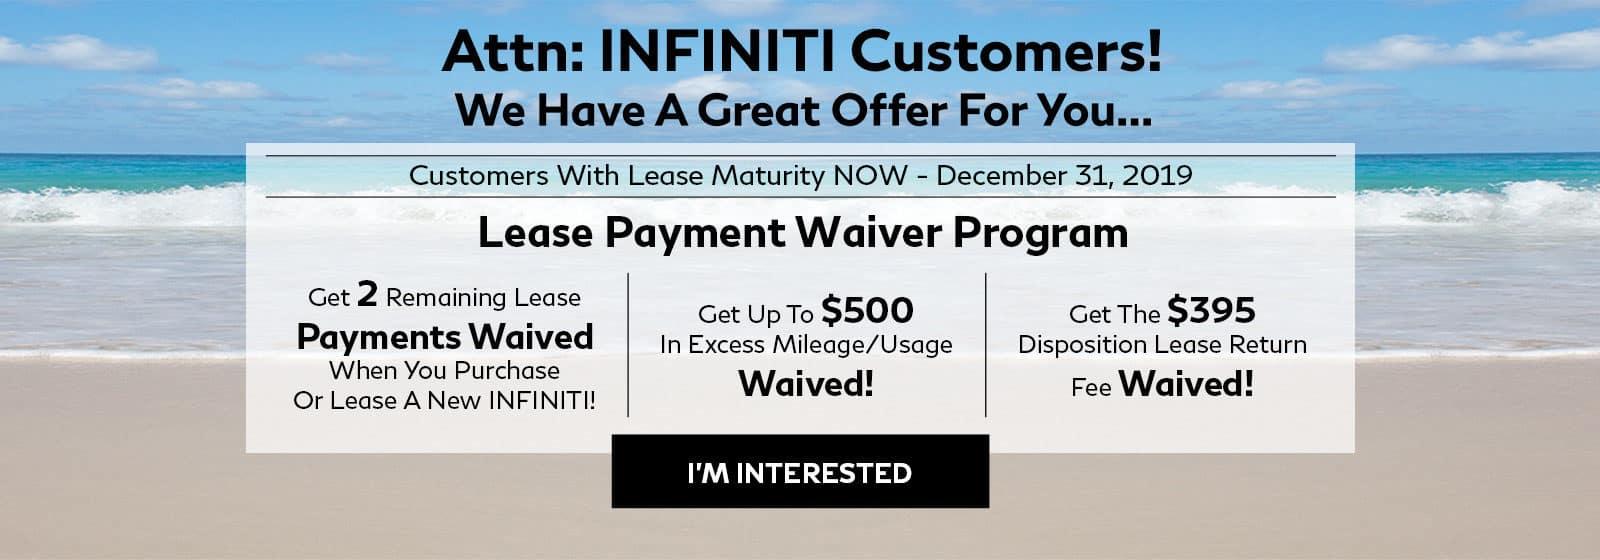 George Harte INFINITI | INFINITI Lease & Loans in